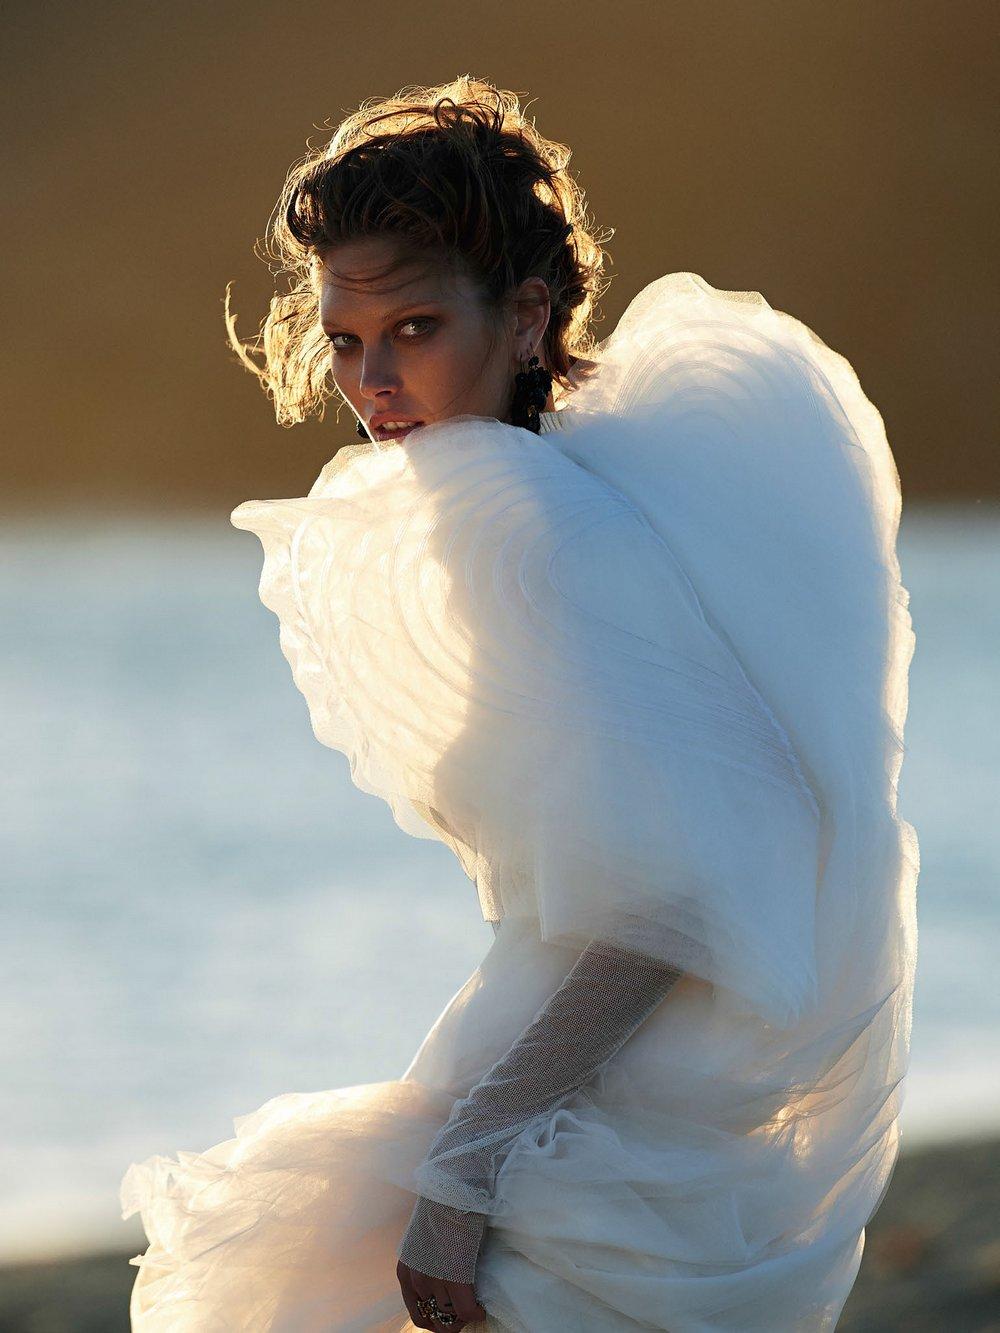 Catherine-McNeil-by-Gilles-Bensimon-for-Vogue-Australia-October-2014-12.jpg